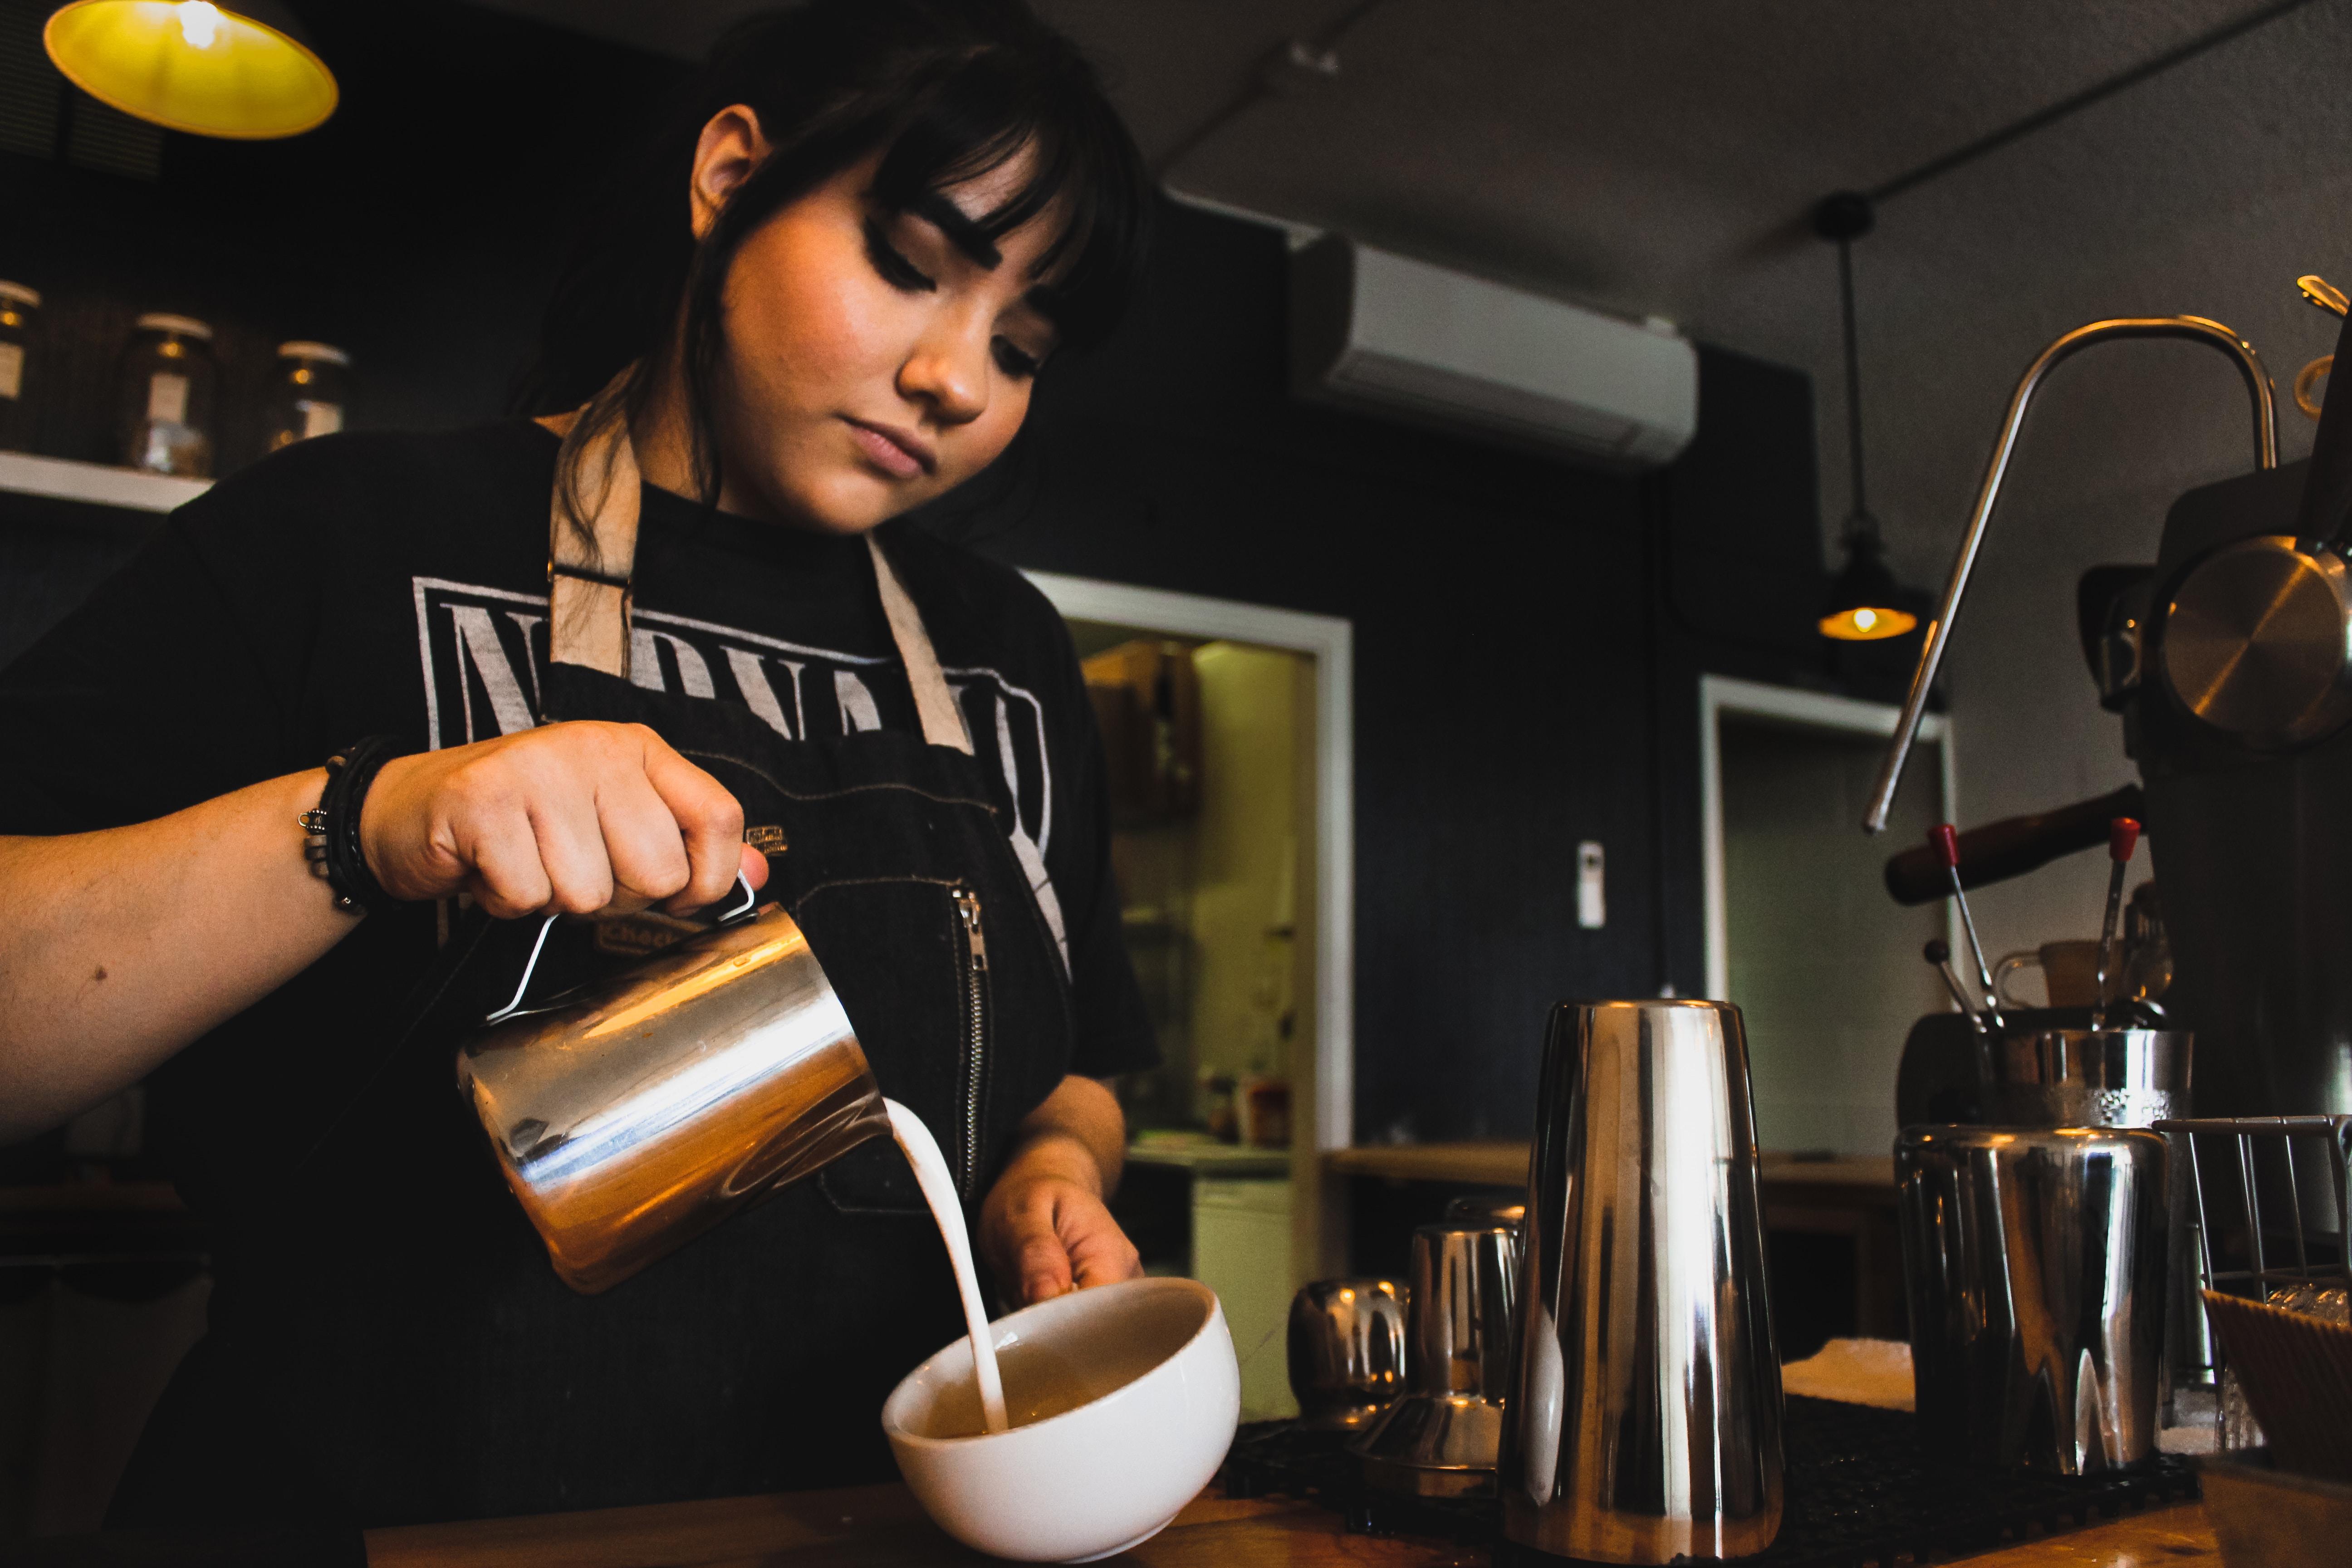 Alyssa, Cafe Manager | Photo Credit: Chloe Leisvia via